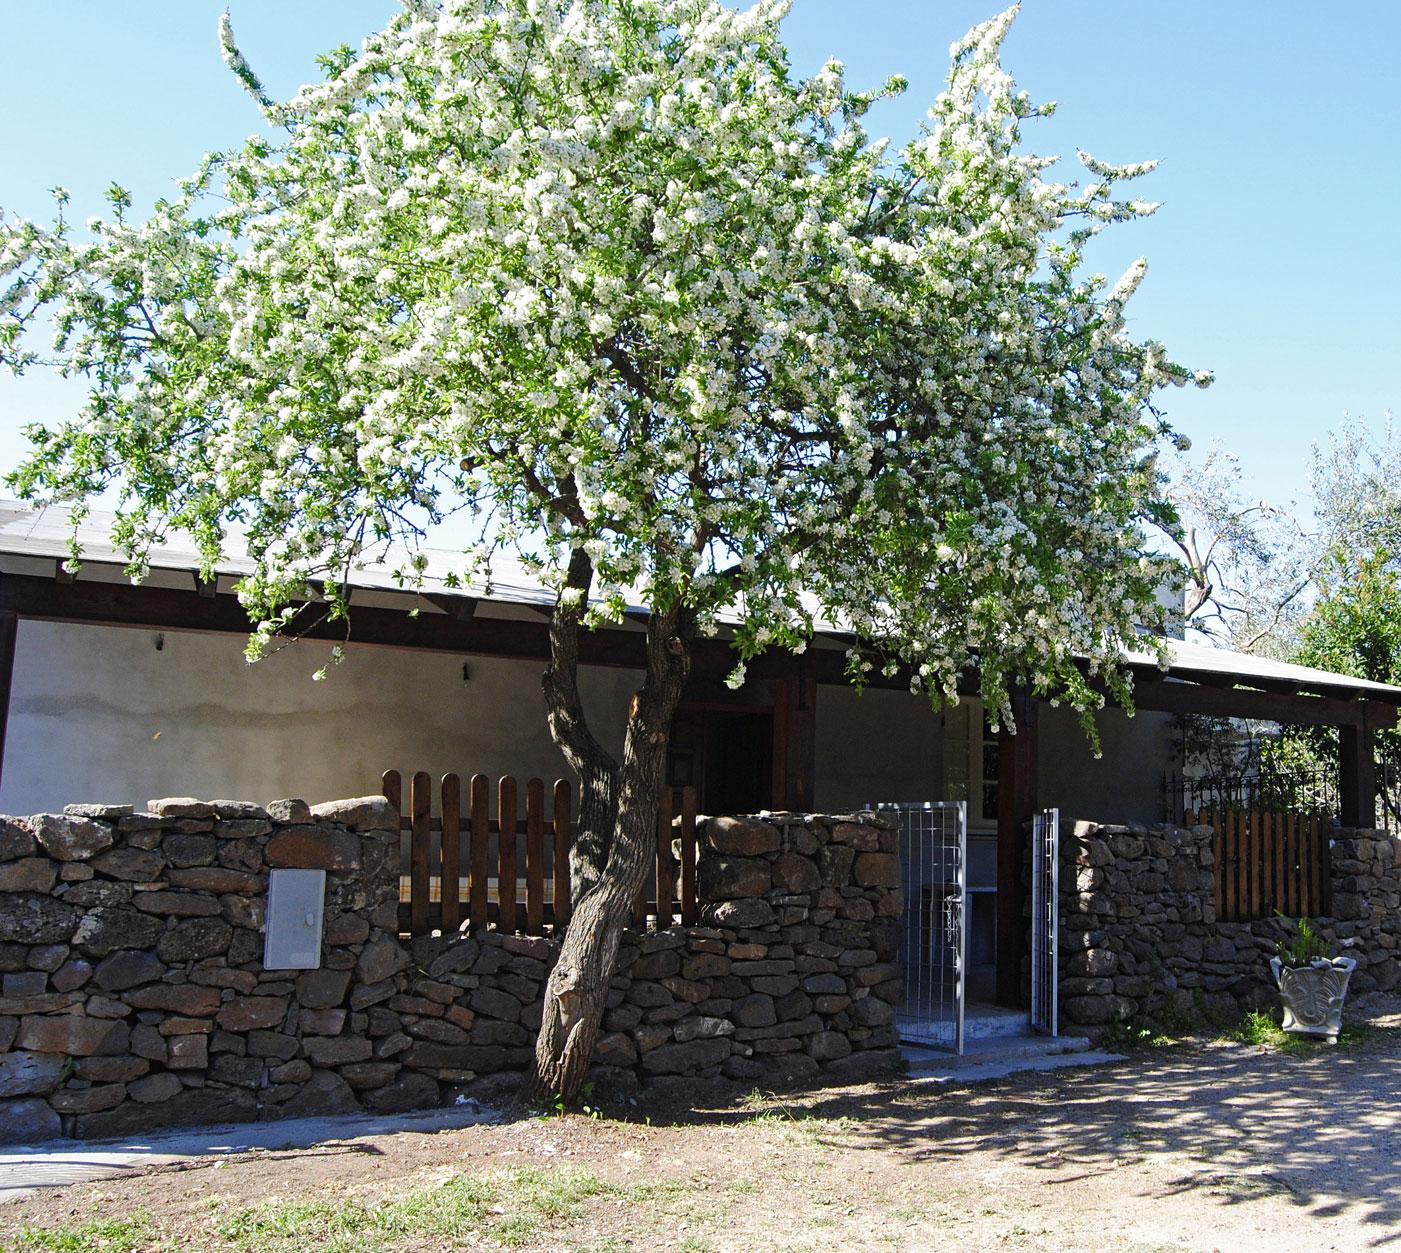 Sardinien ferienhaus am strand 200 meter casa pinuccio for Haus sardinien